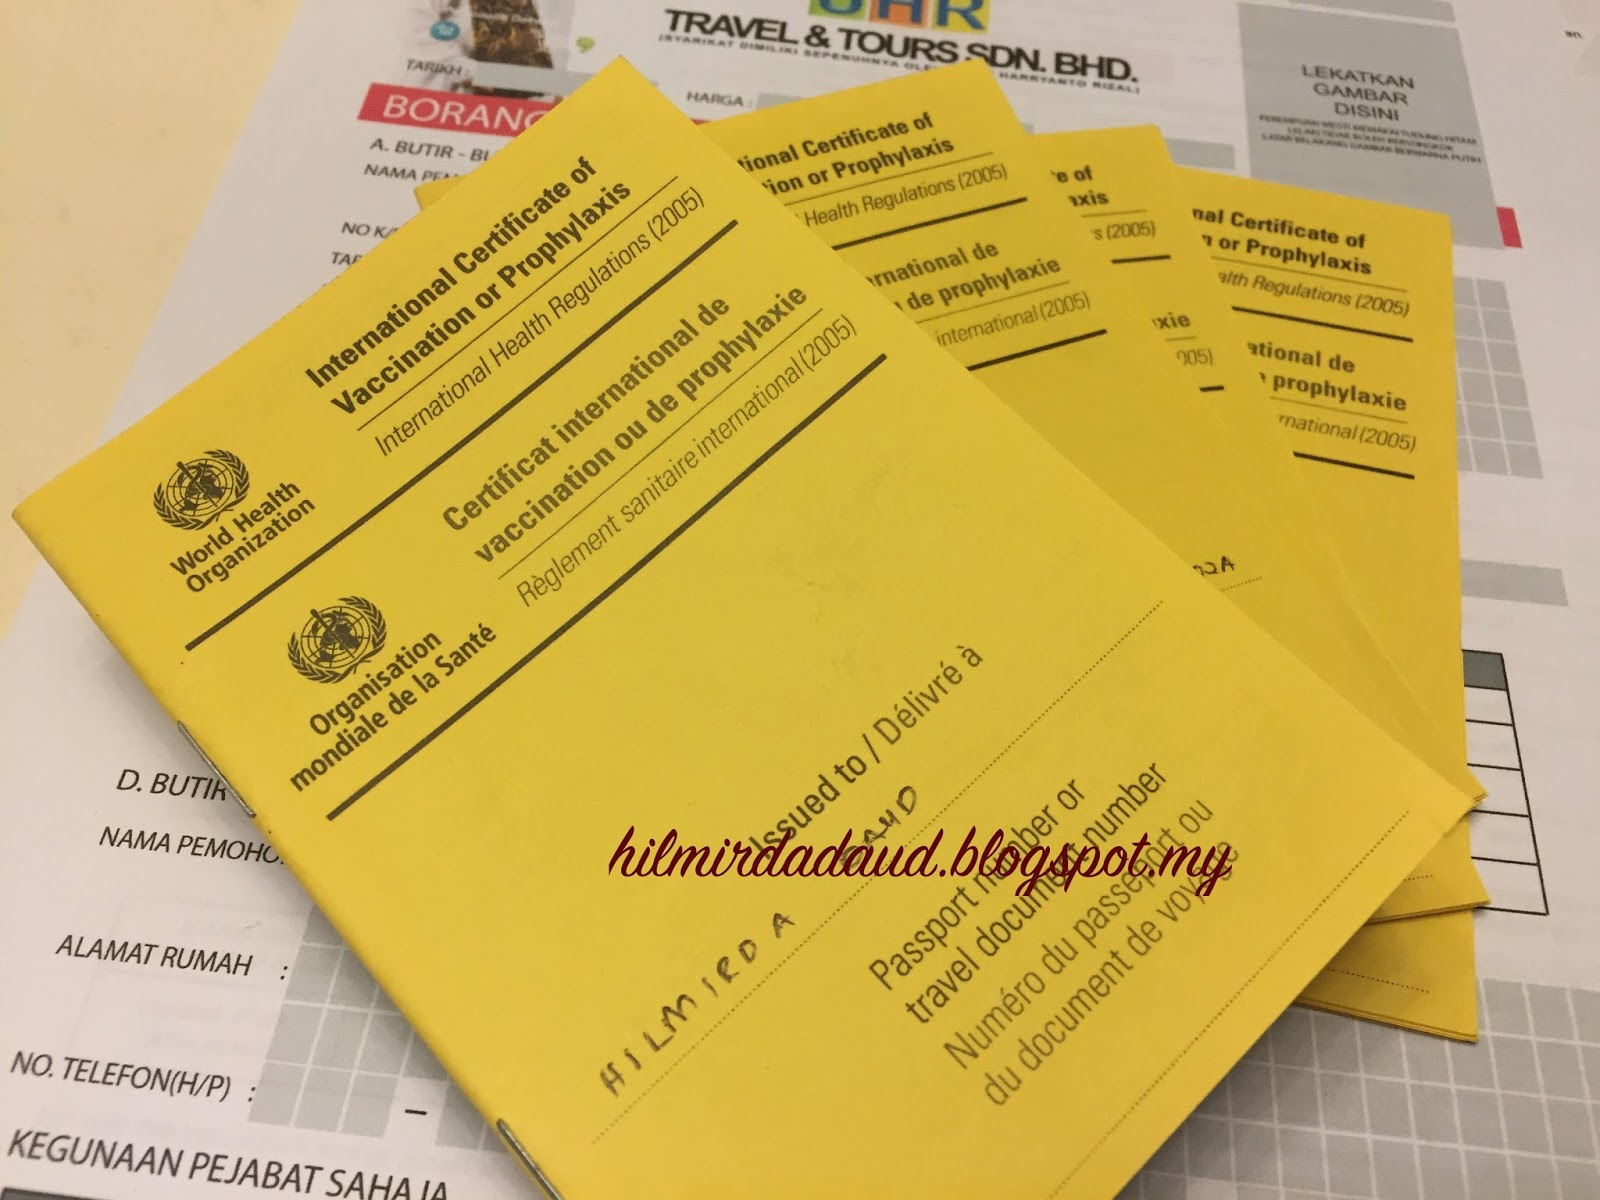 Dokumen Yang Perlu Untuk Memohon Visa Umrah Bersama Keluarga